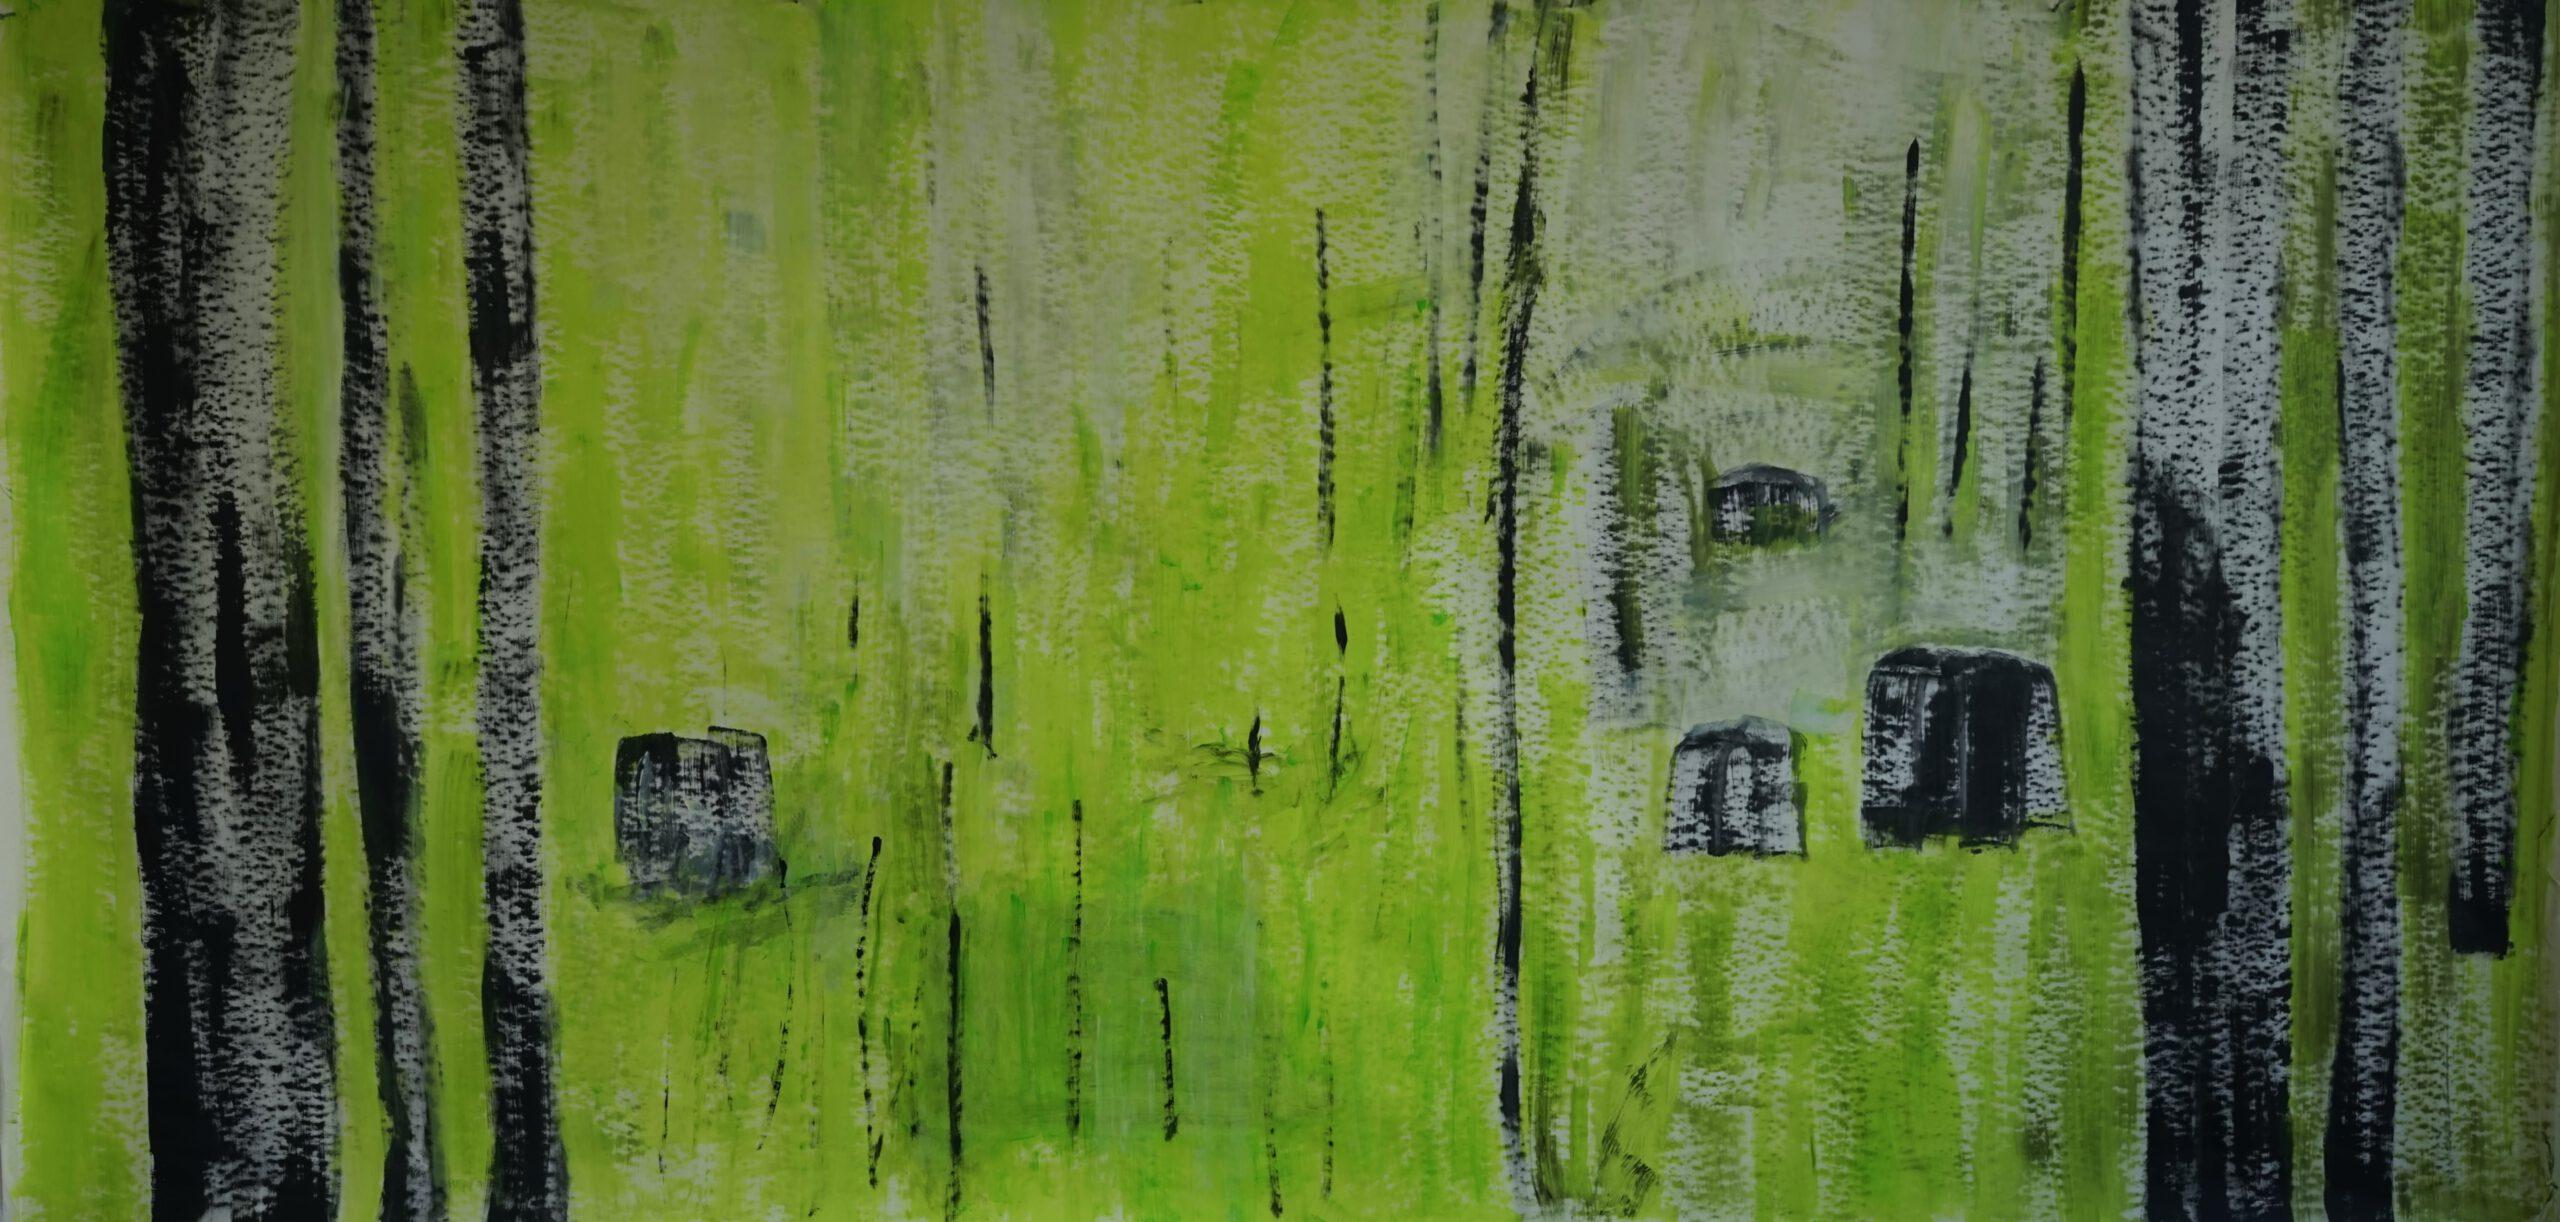 Serie IV, 3m x 1,50m, Acryl auf Papier